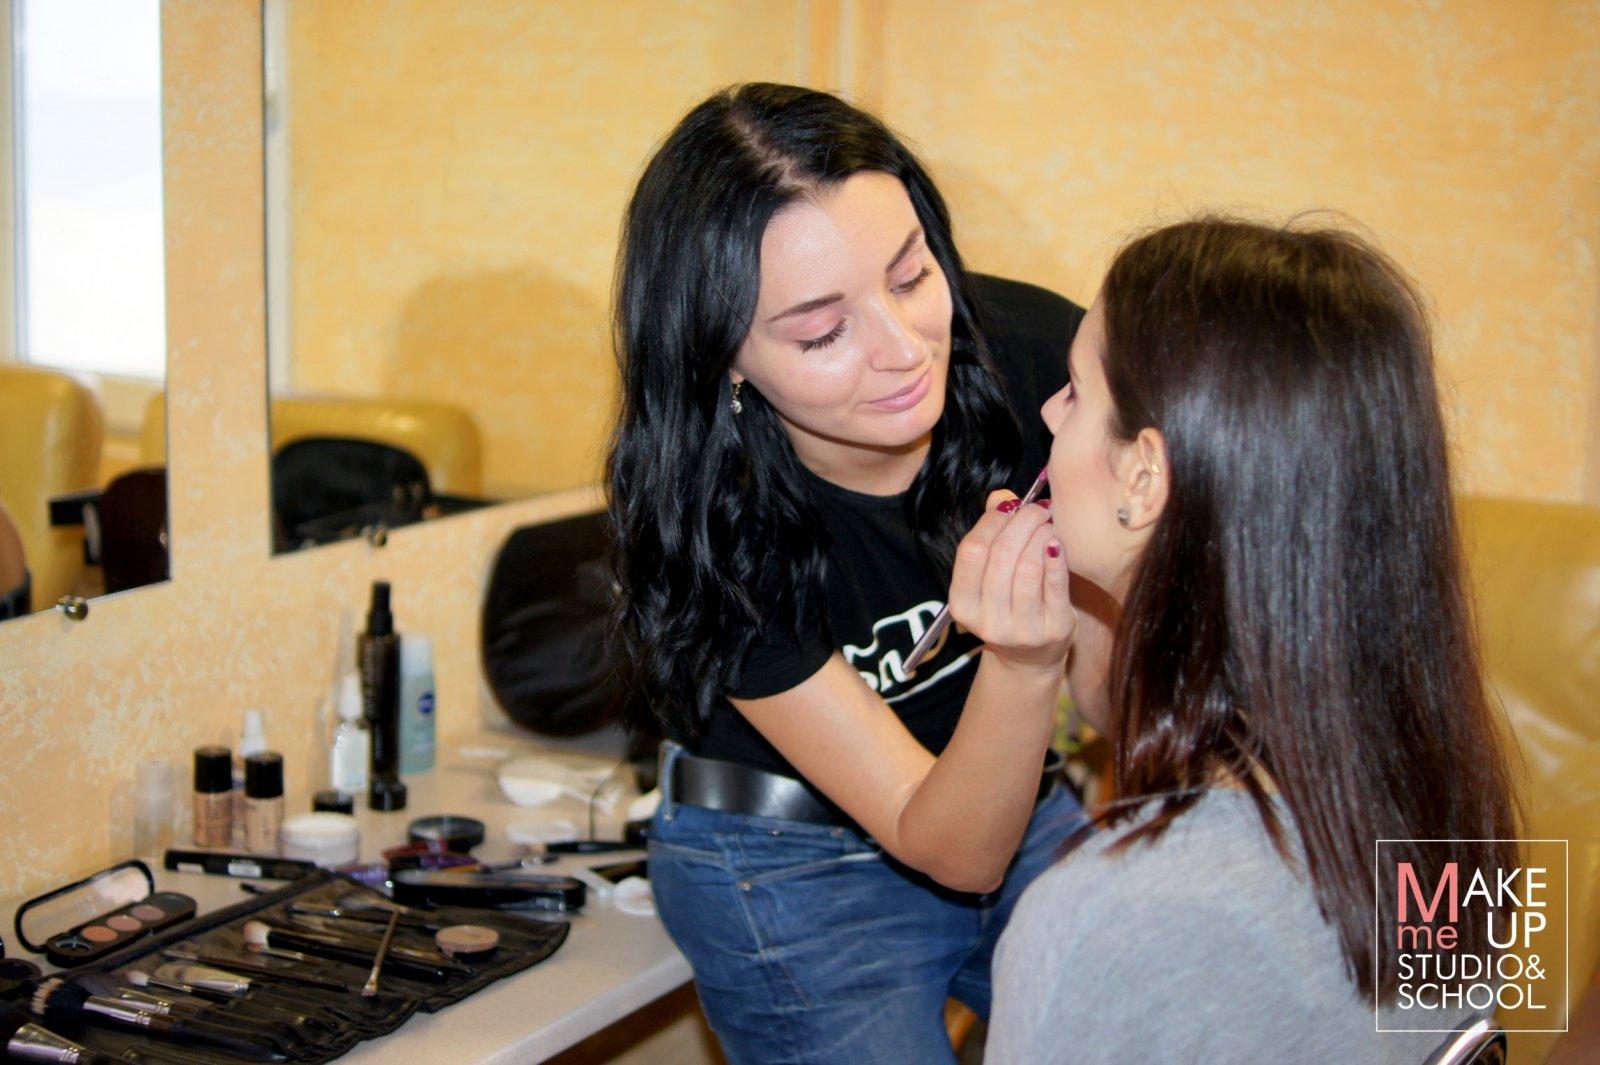 MMUSS школа макияжа в Одессе 7 лого (Custom).jpg